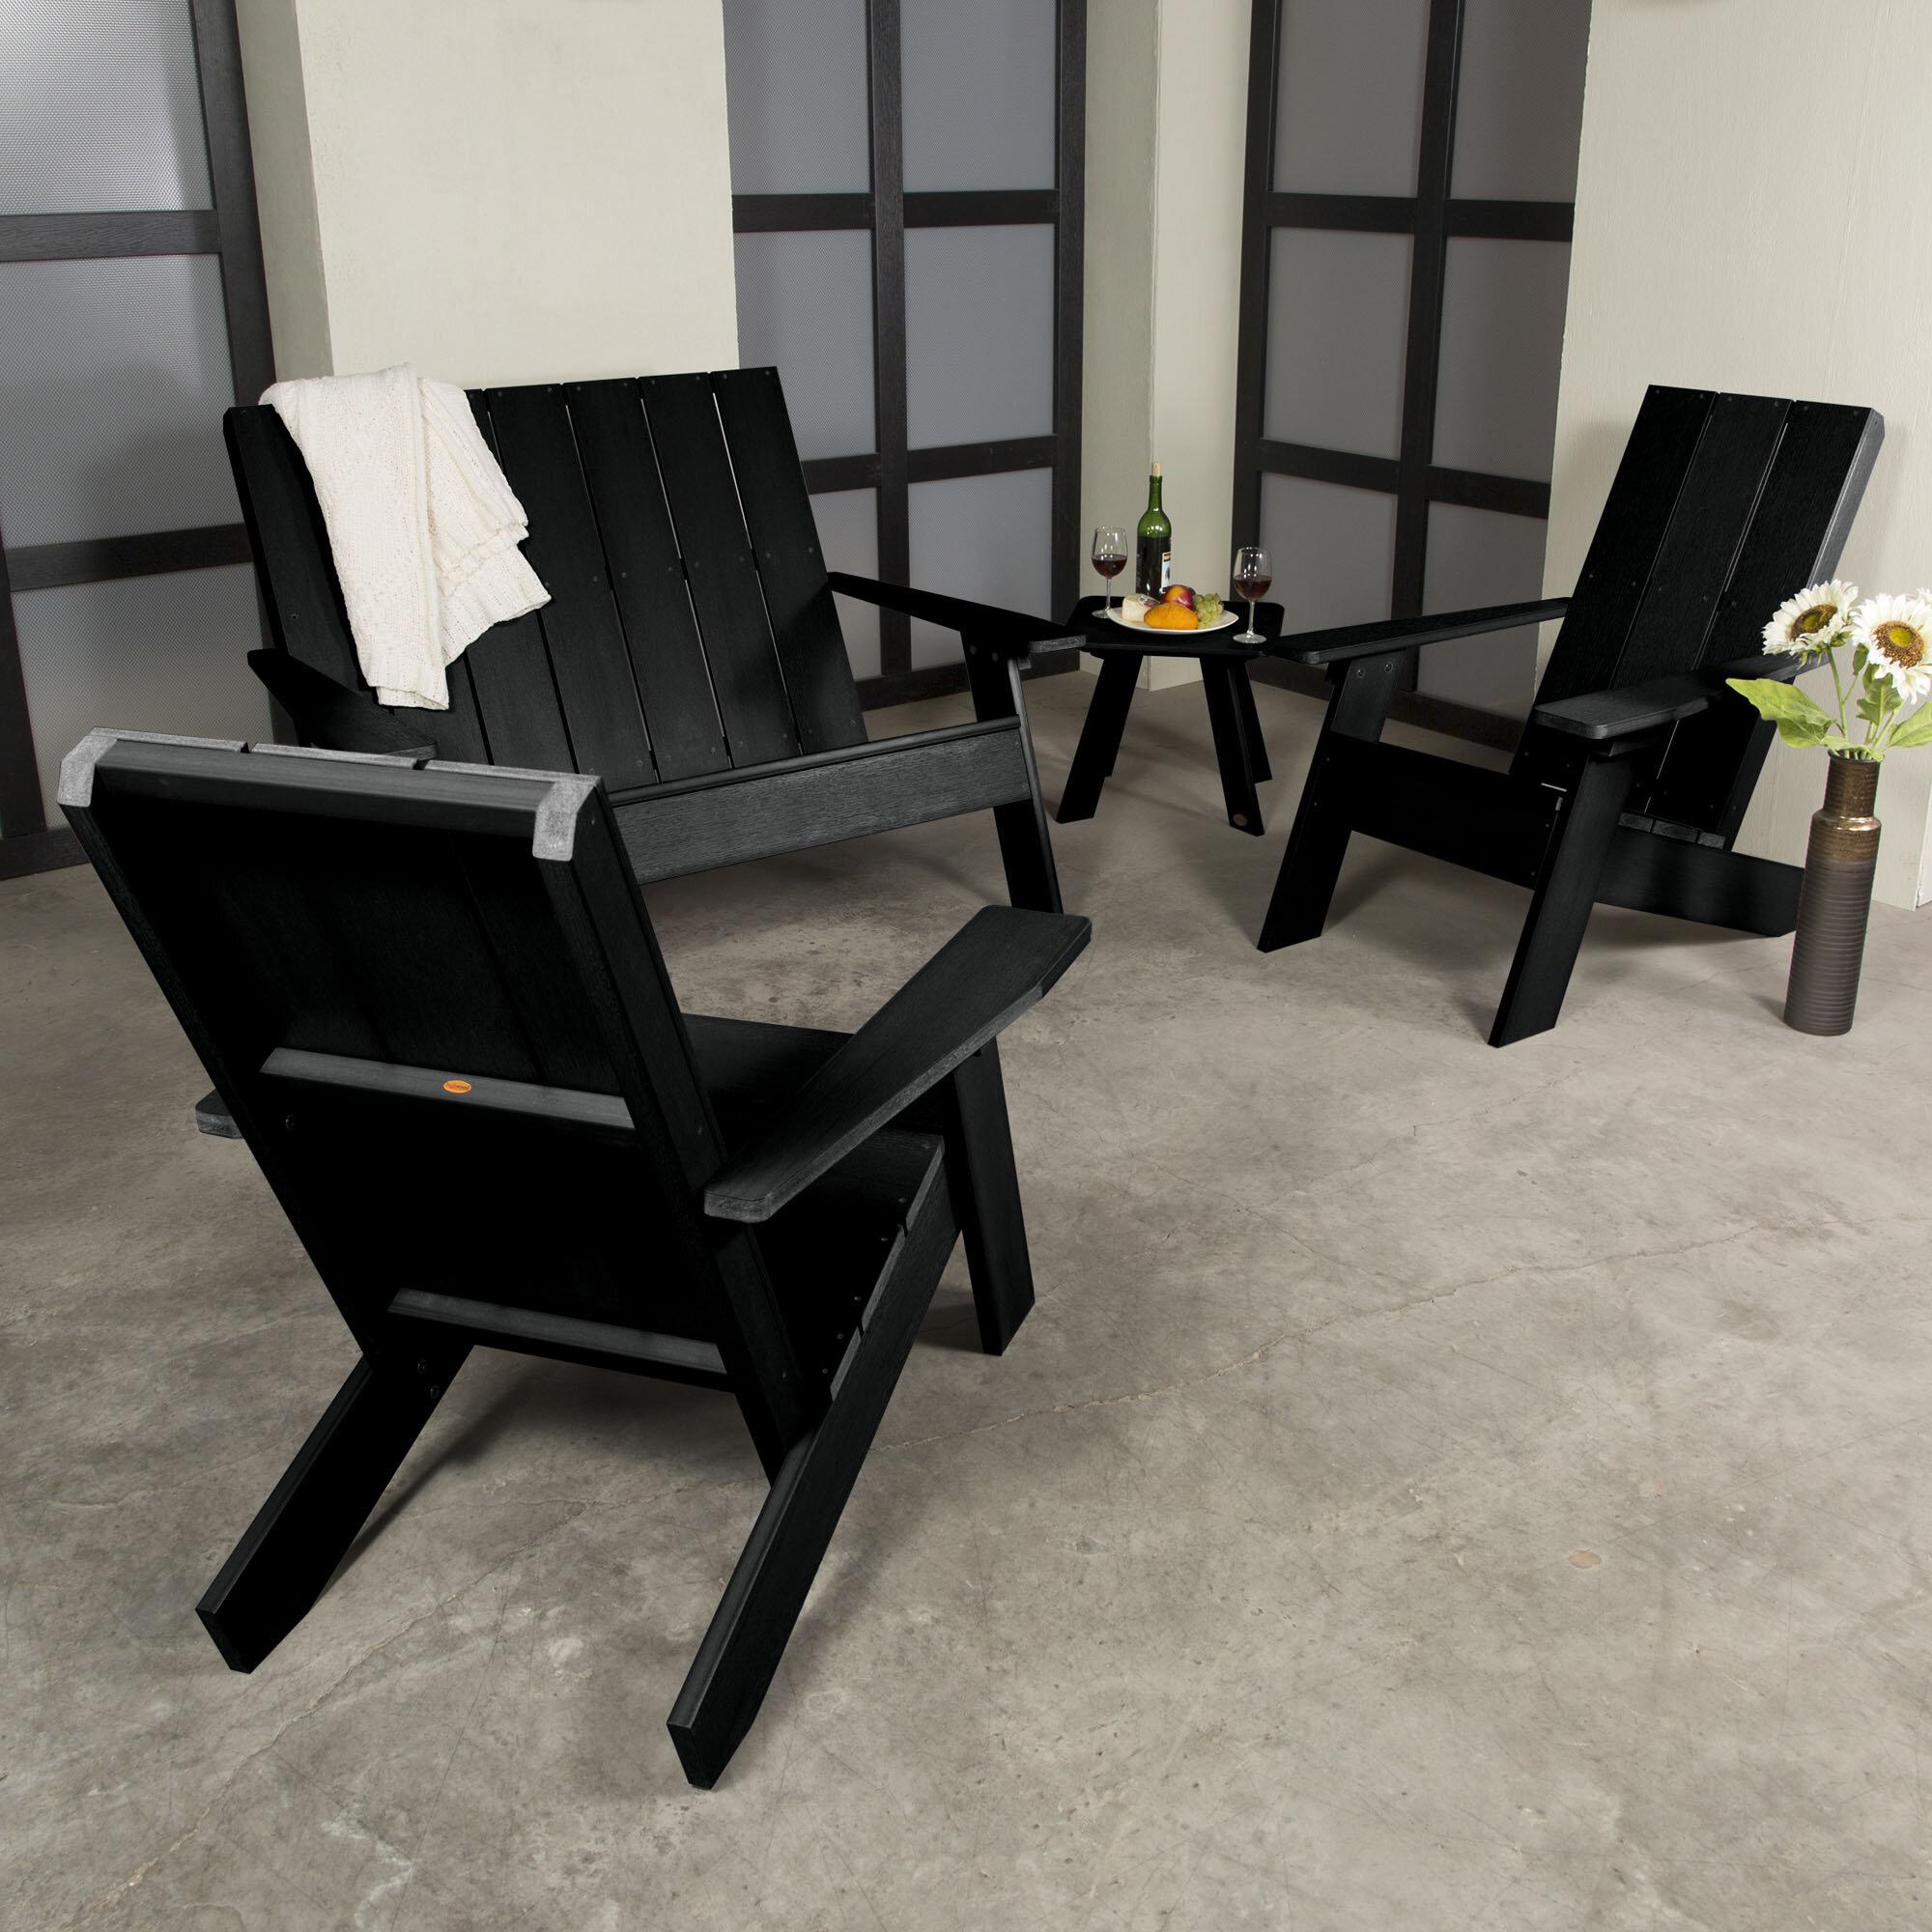 Adirondack Coffee Table Set: Highwood USA Barcelona Plastic 4 Piece Adirondack Chair